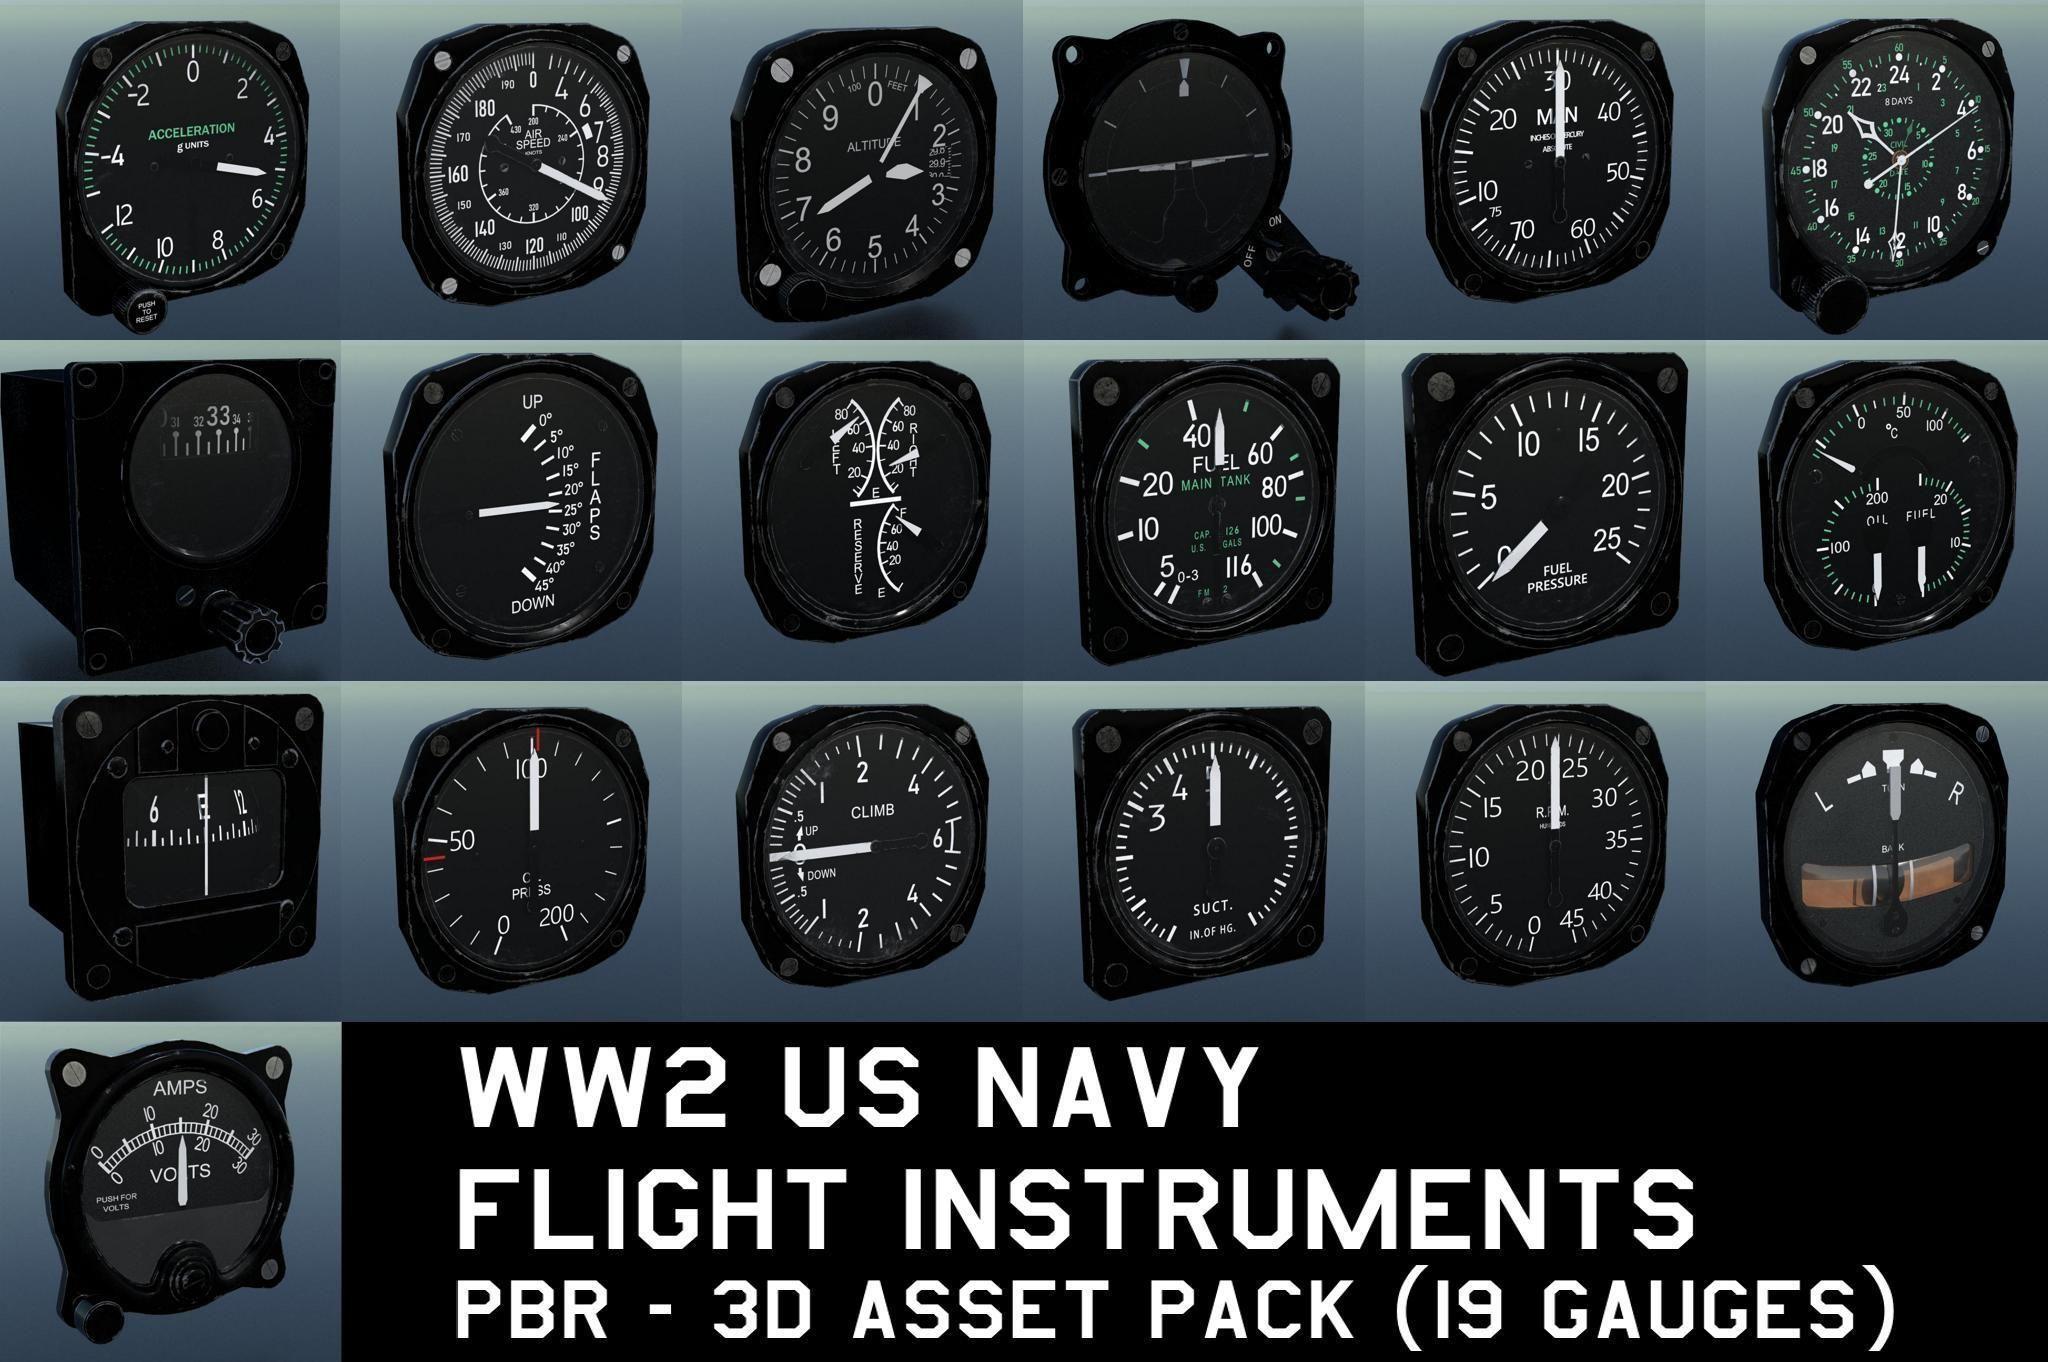 WW2 US NAVY FLIGHT INSTRUMENTS - ASSET PACK